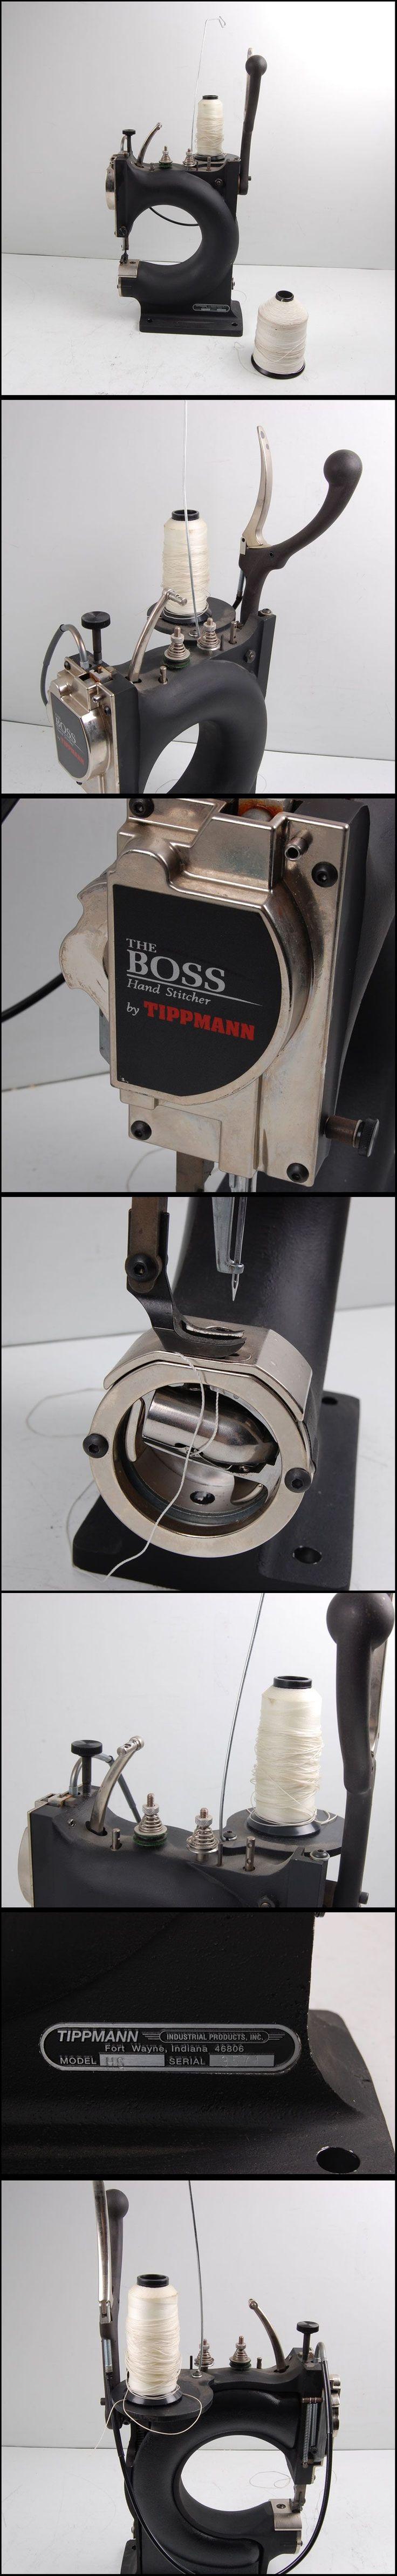 Giggity... Tippmann Boss Model HS Hand Stitcher Leather Sewing Machine